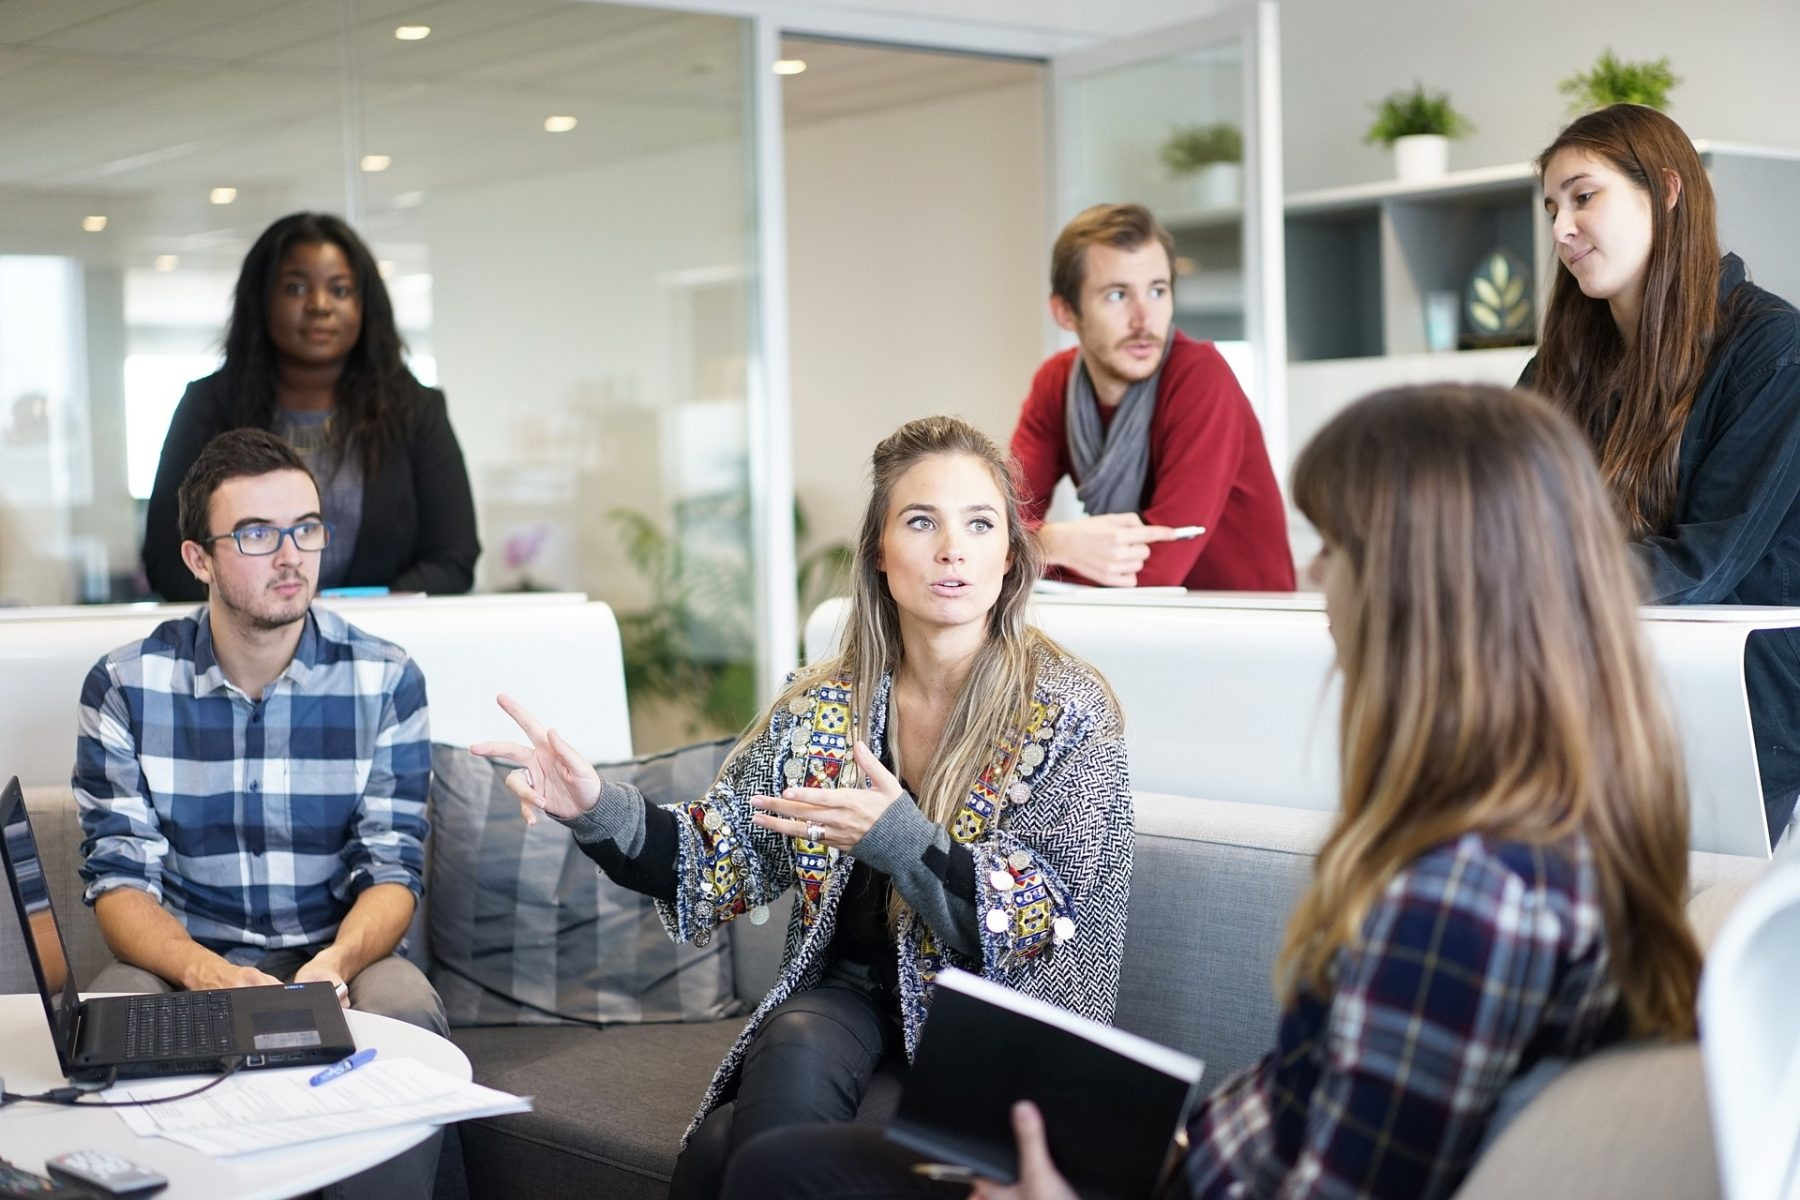 - Diversity Across The Board in the Boardroom